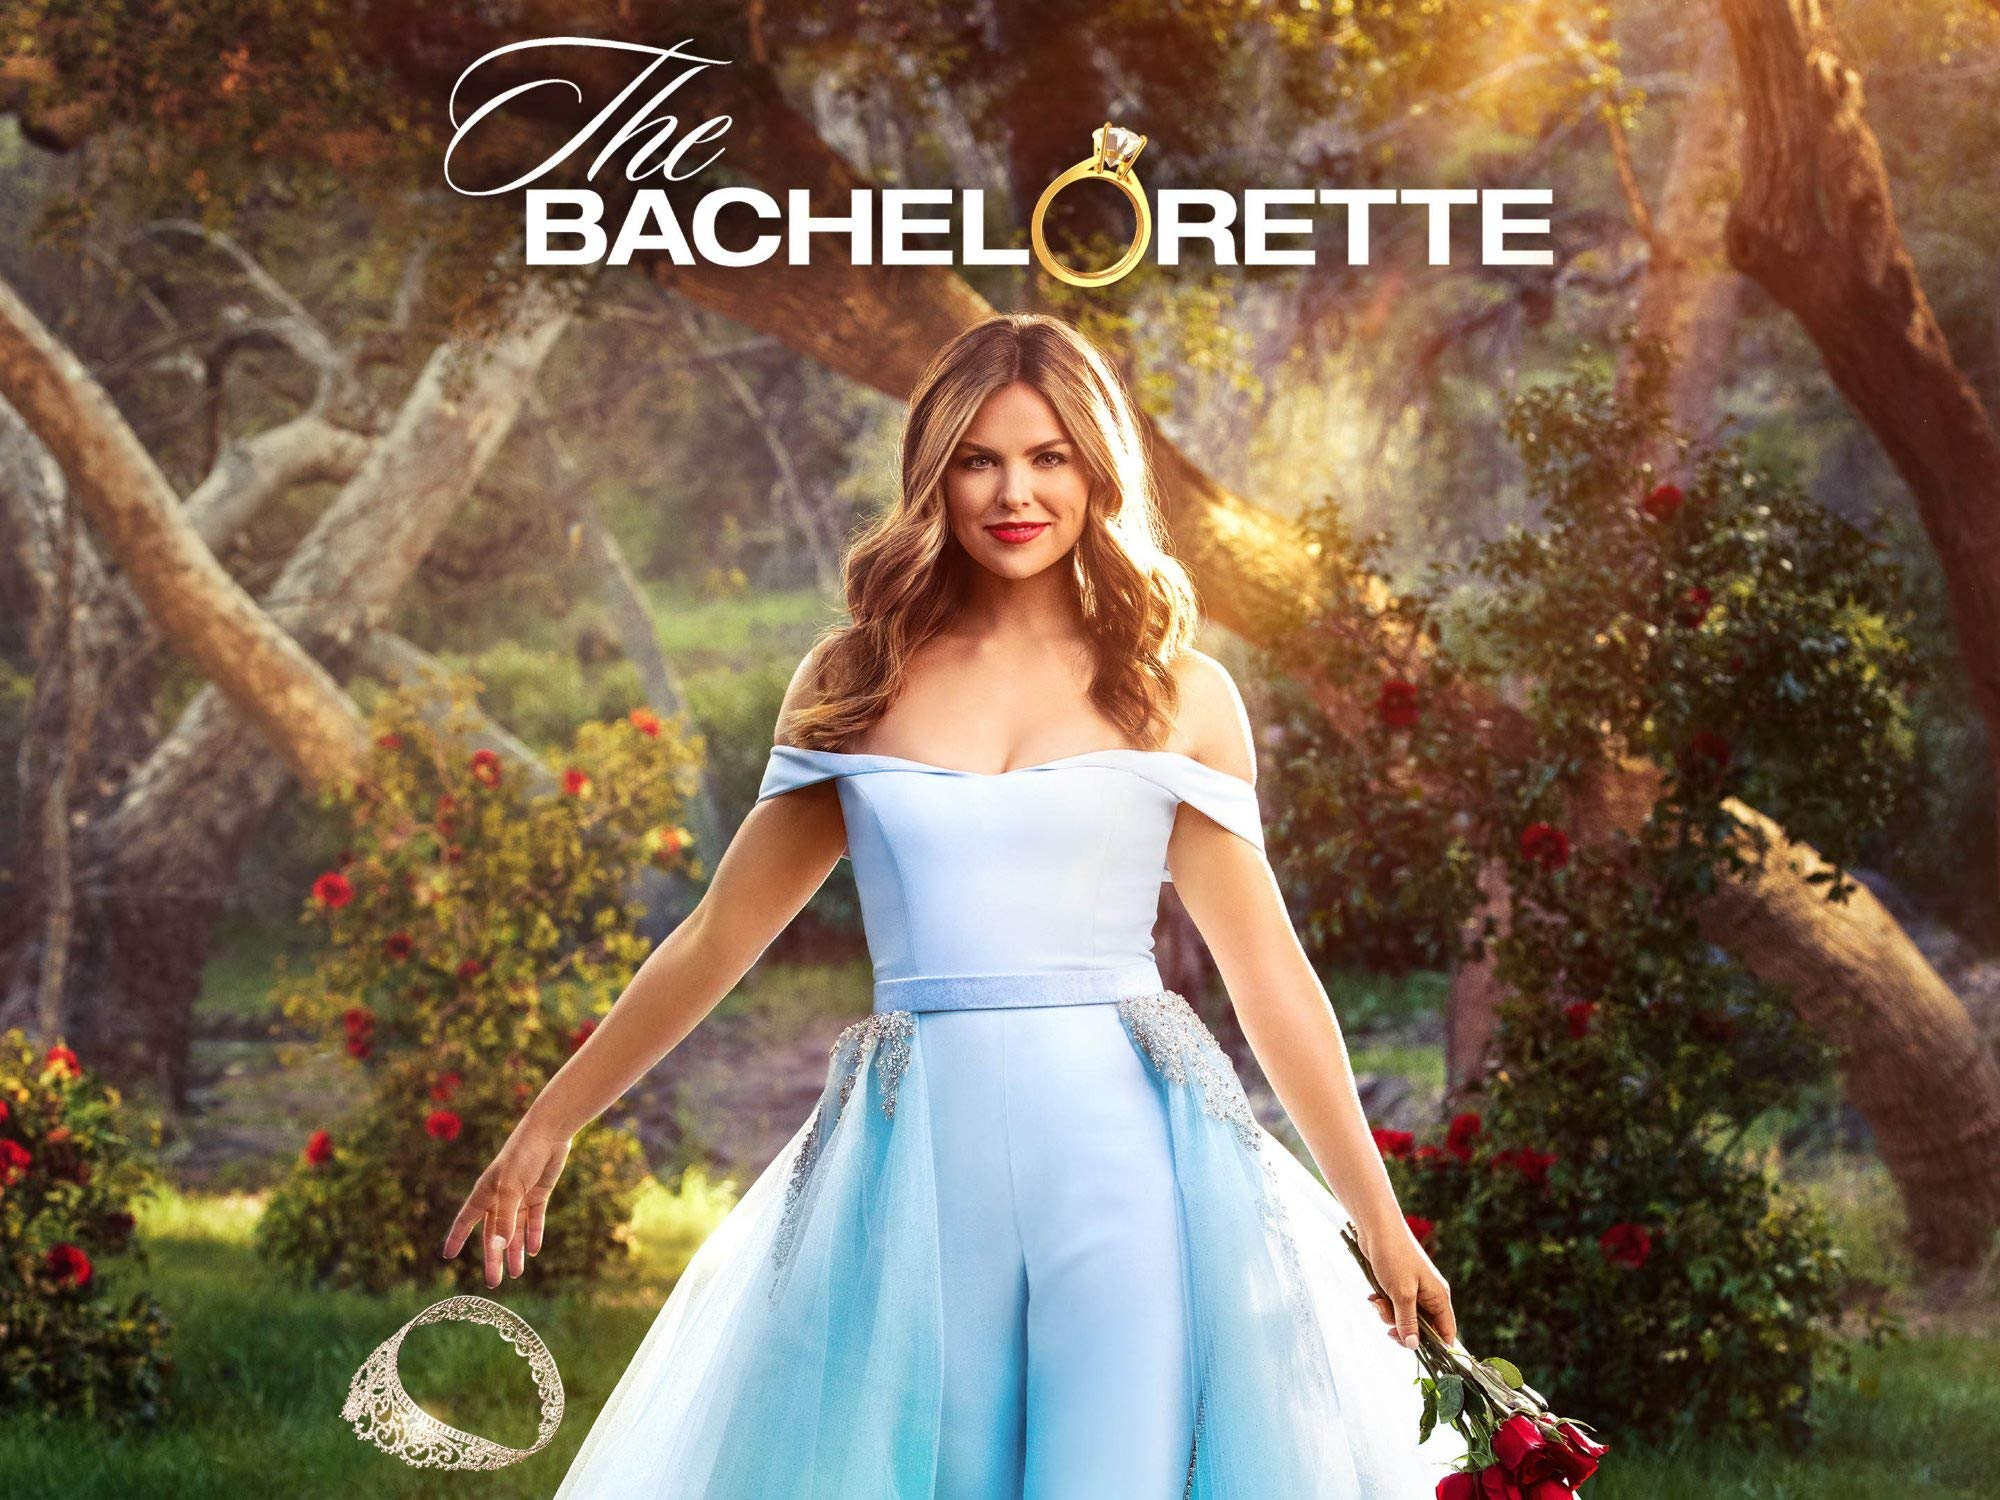 the bachelorette season 13 watch online free